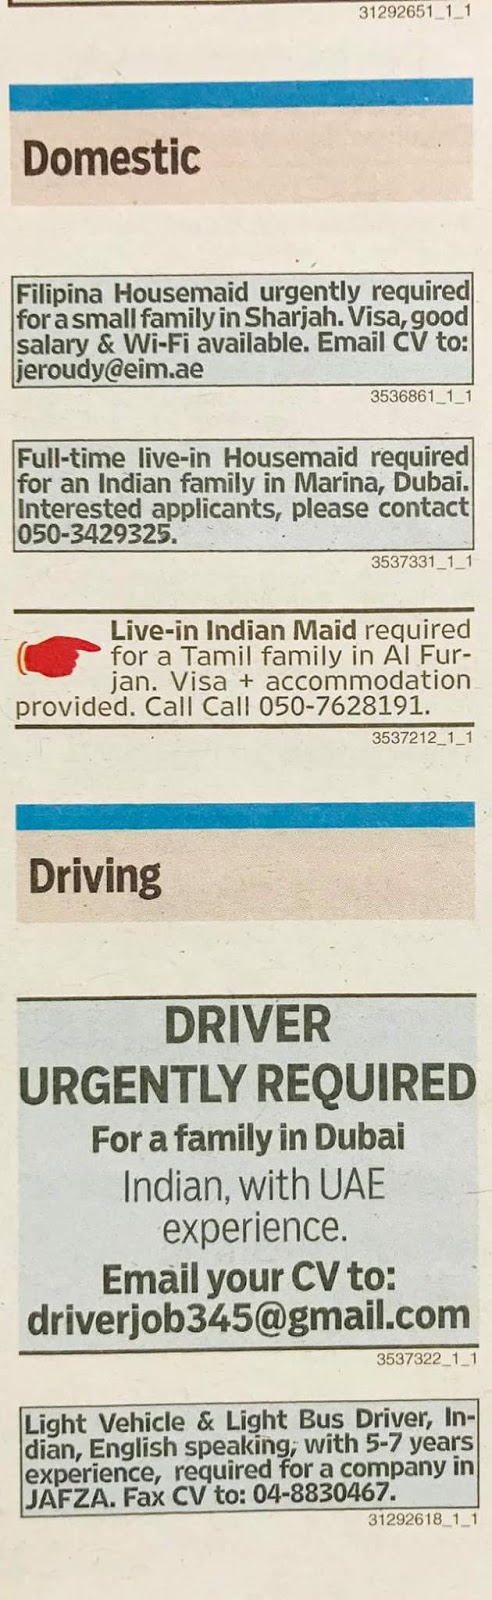 Required DRIVER for UAE JOBS LOCAL HIRING KHALEEJ TIMES-UAE-0810912